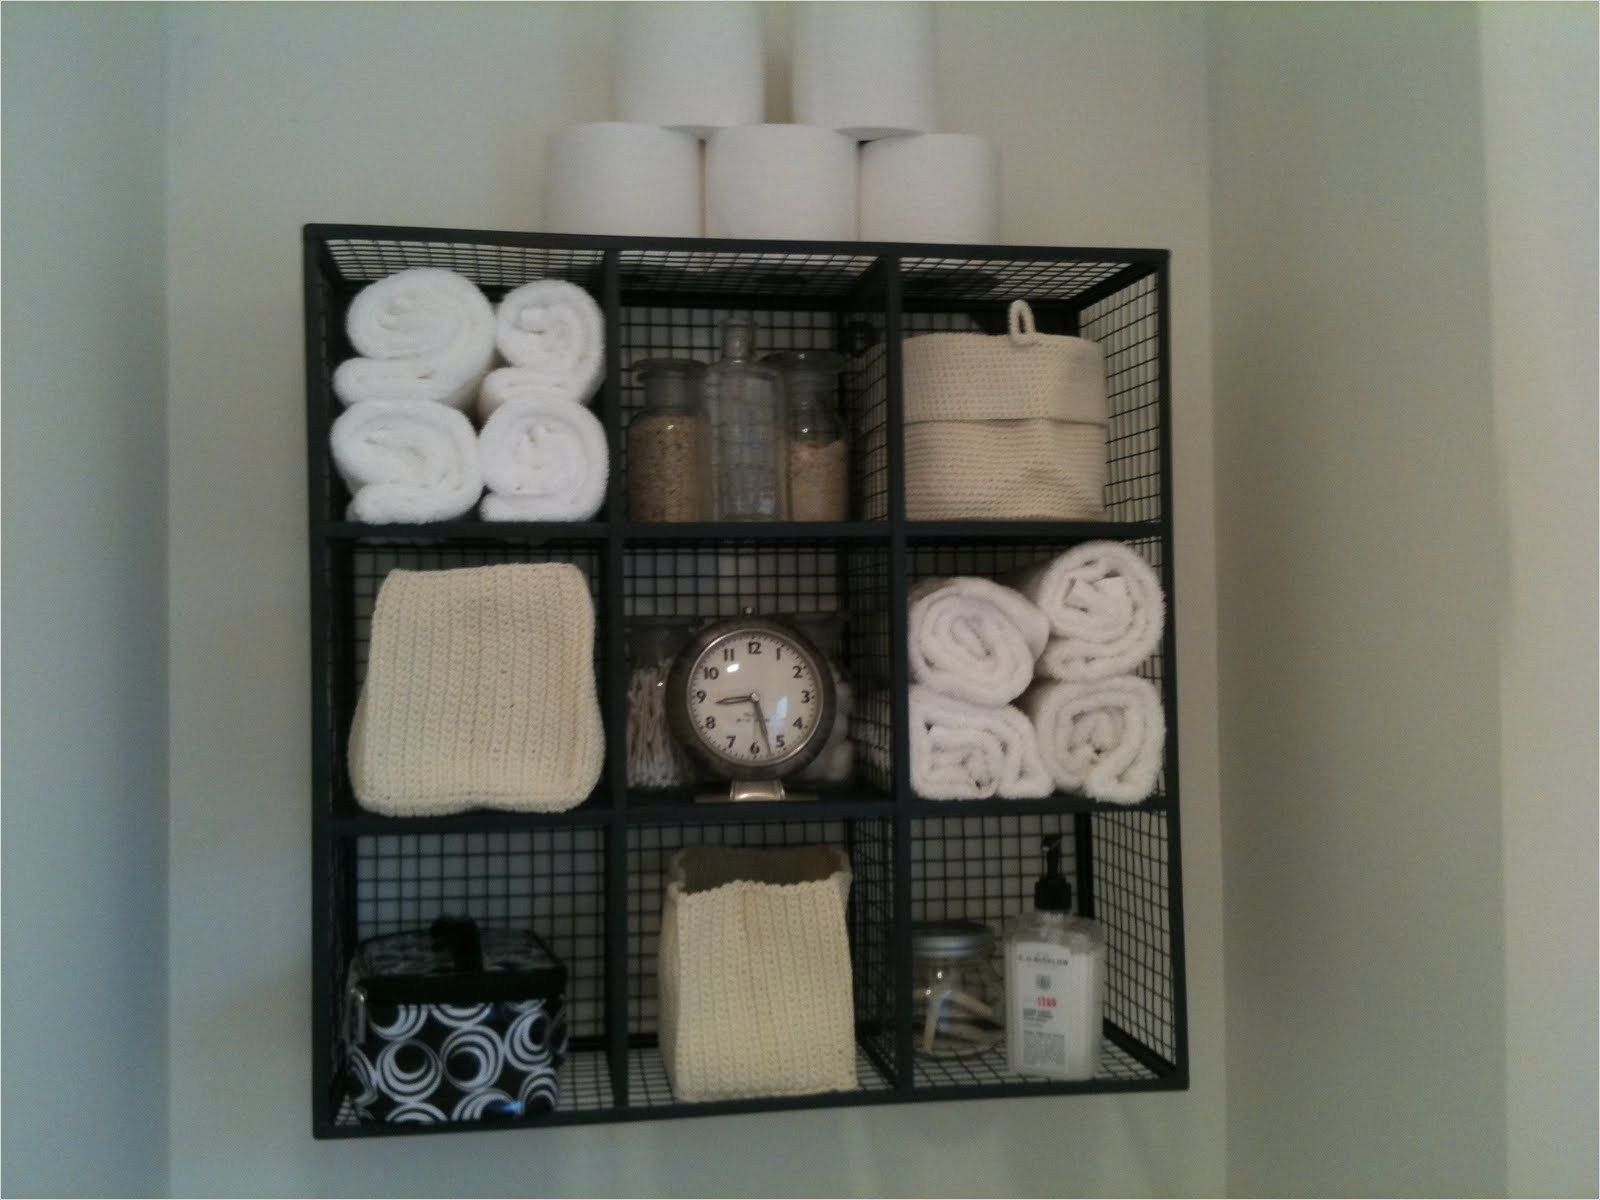 36 Awesome Bathroom Rowel Storage Ideas Toilet Storage Bathroom Towel Storage Small Bathroom Storage